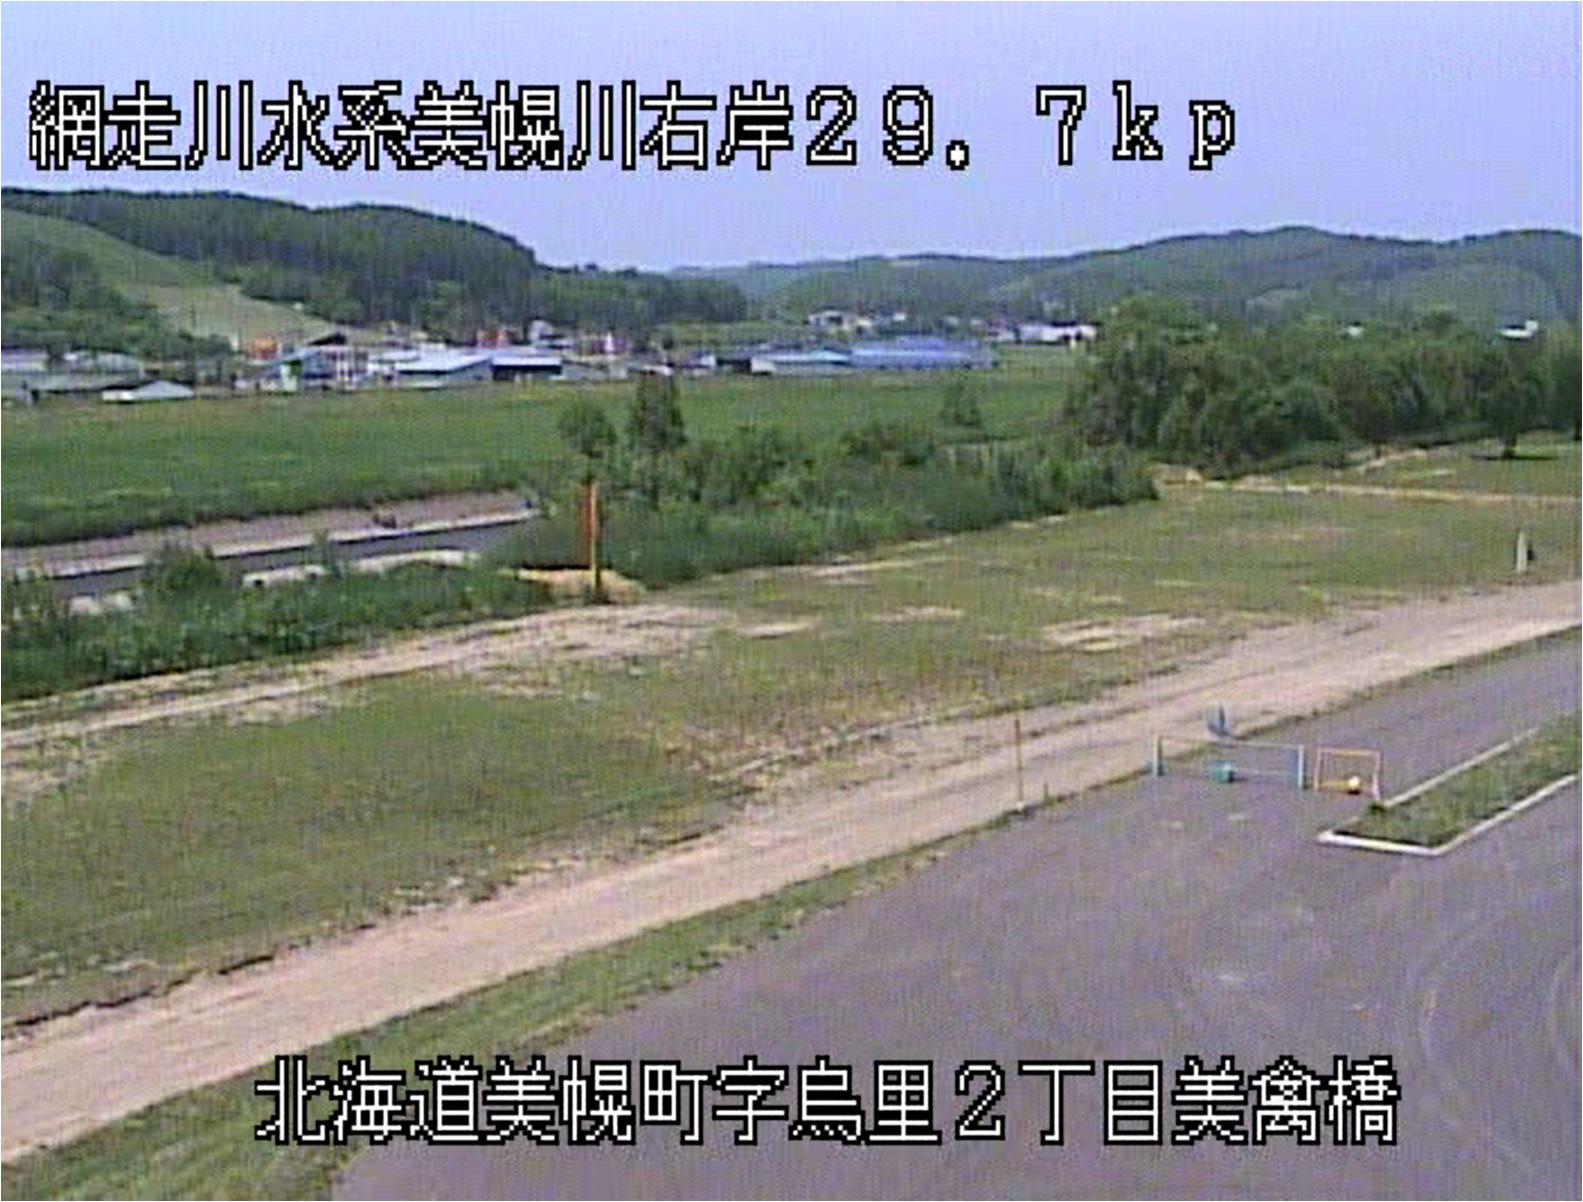 Normal river level image